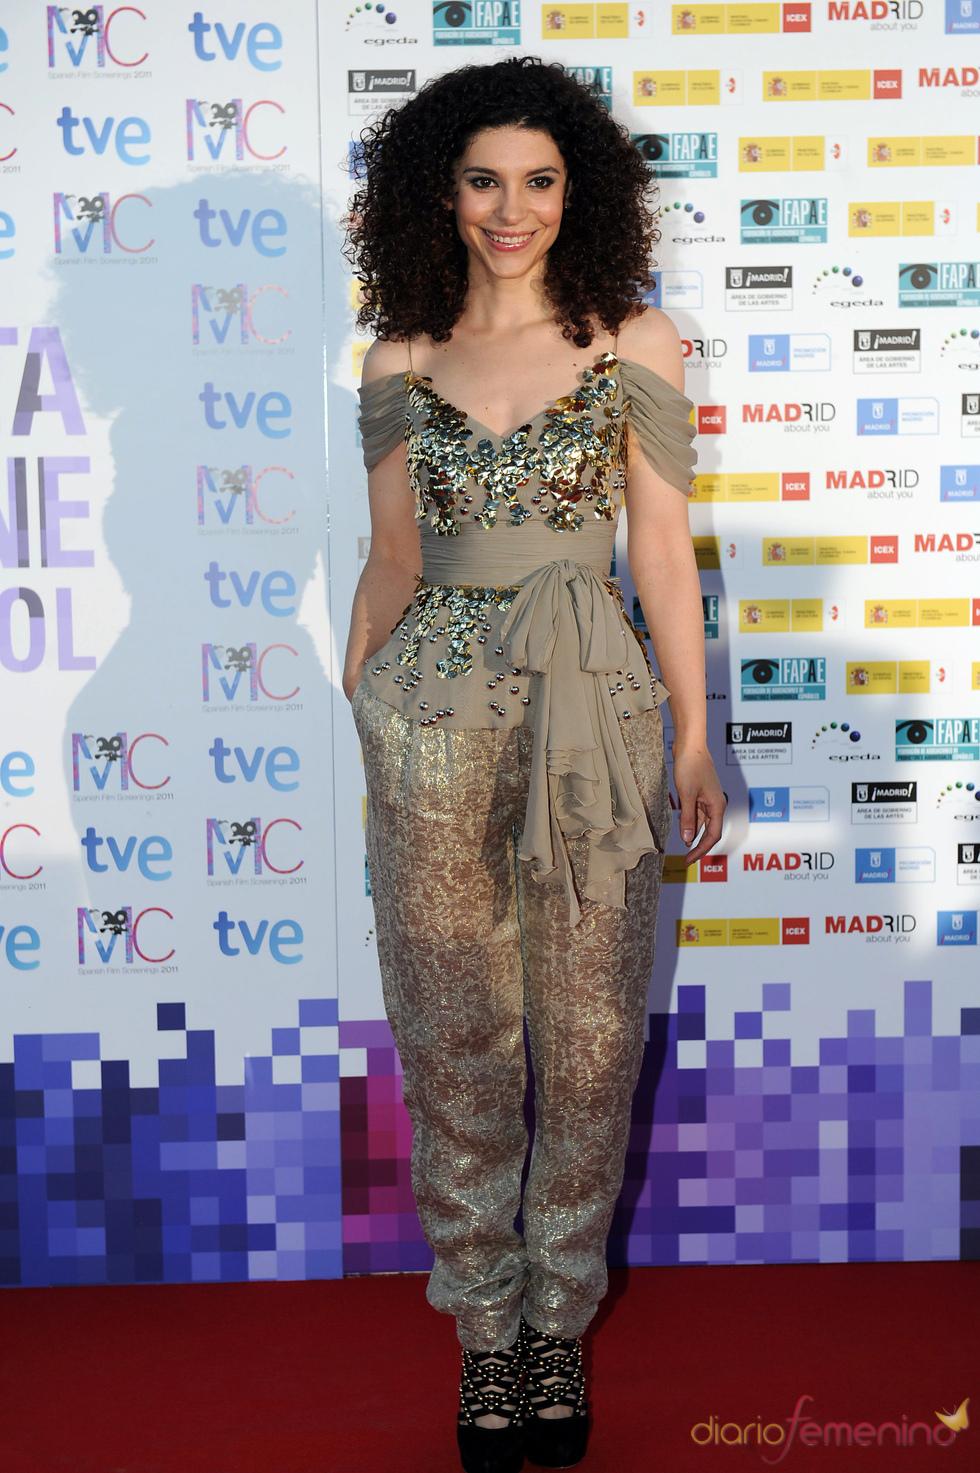 Irene Visedo en la Fiesta del Cine español